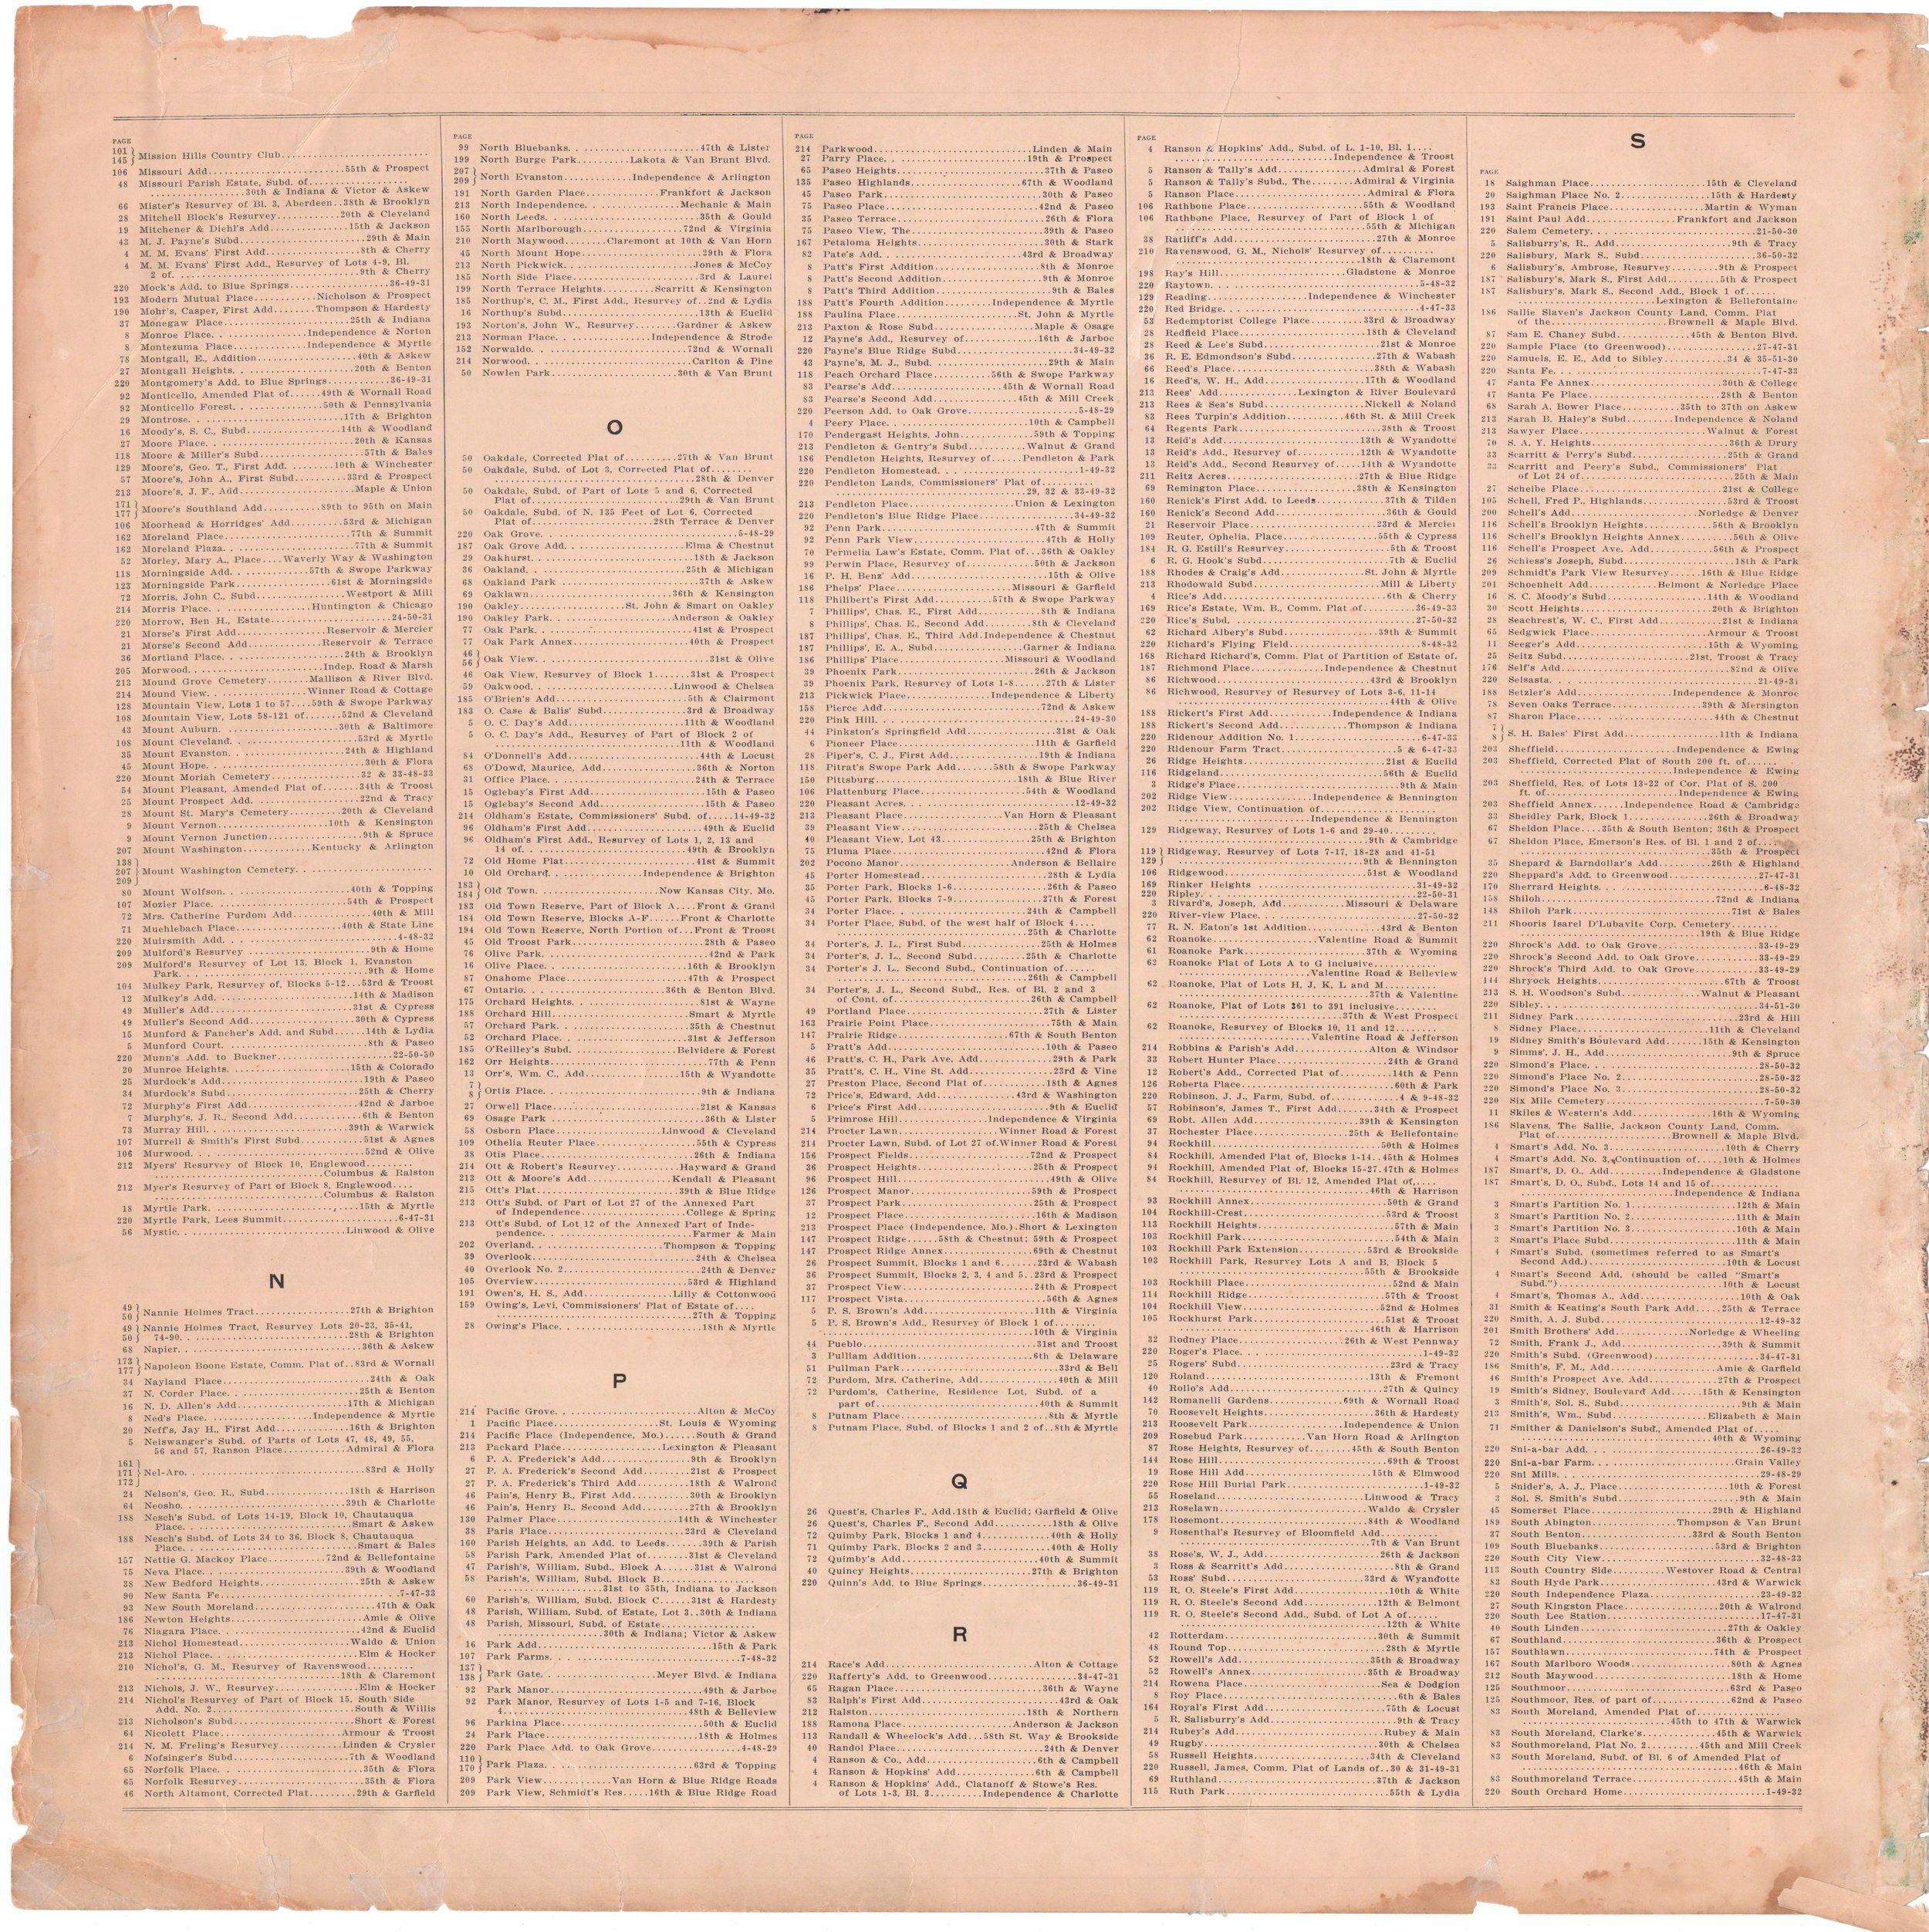 1925 TUTTLE_AYERS_Index_N-S.JPG